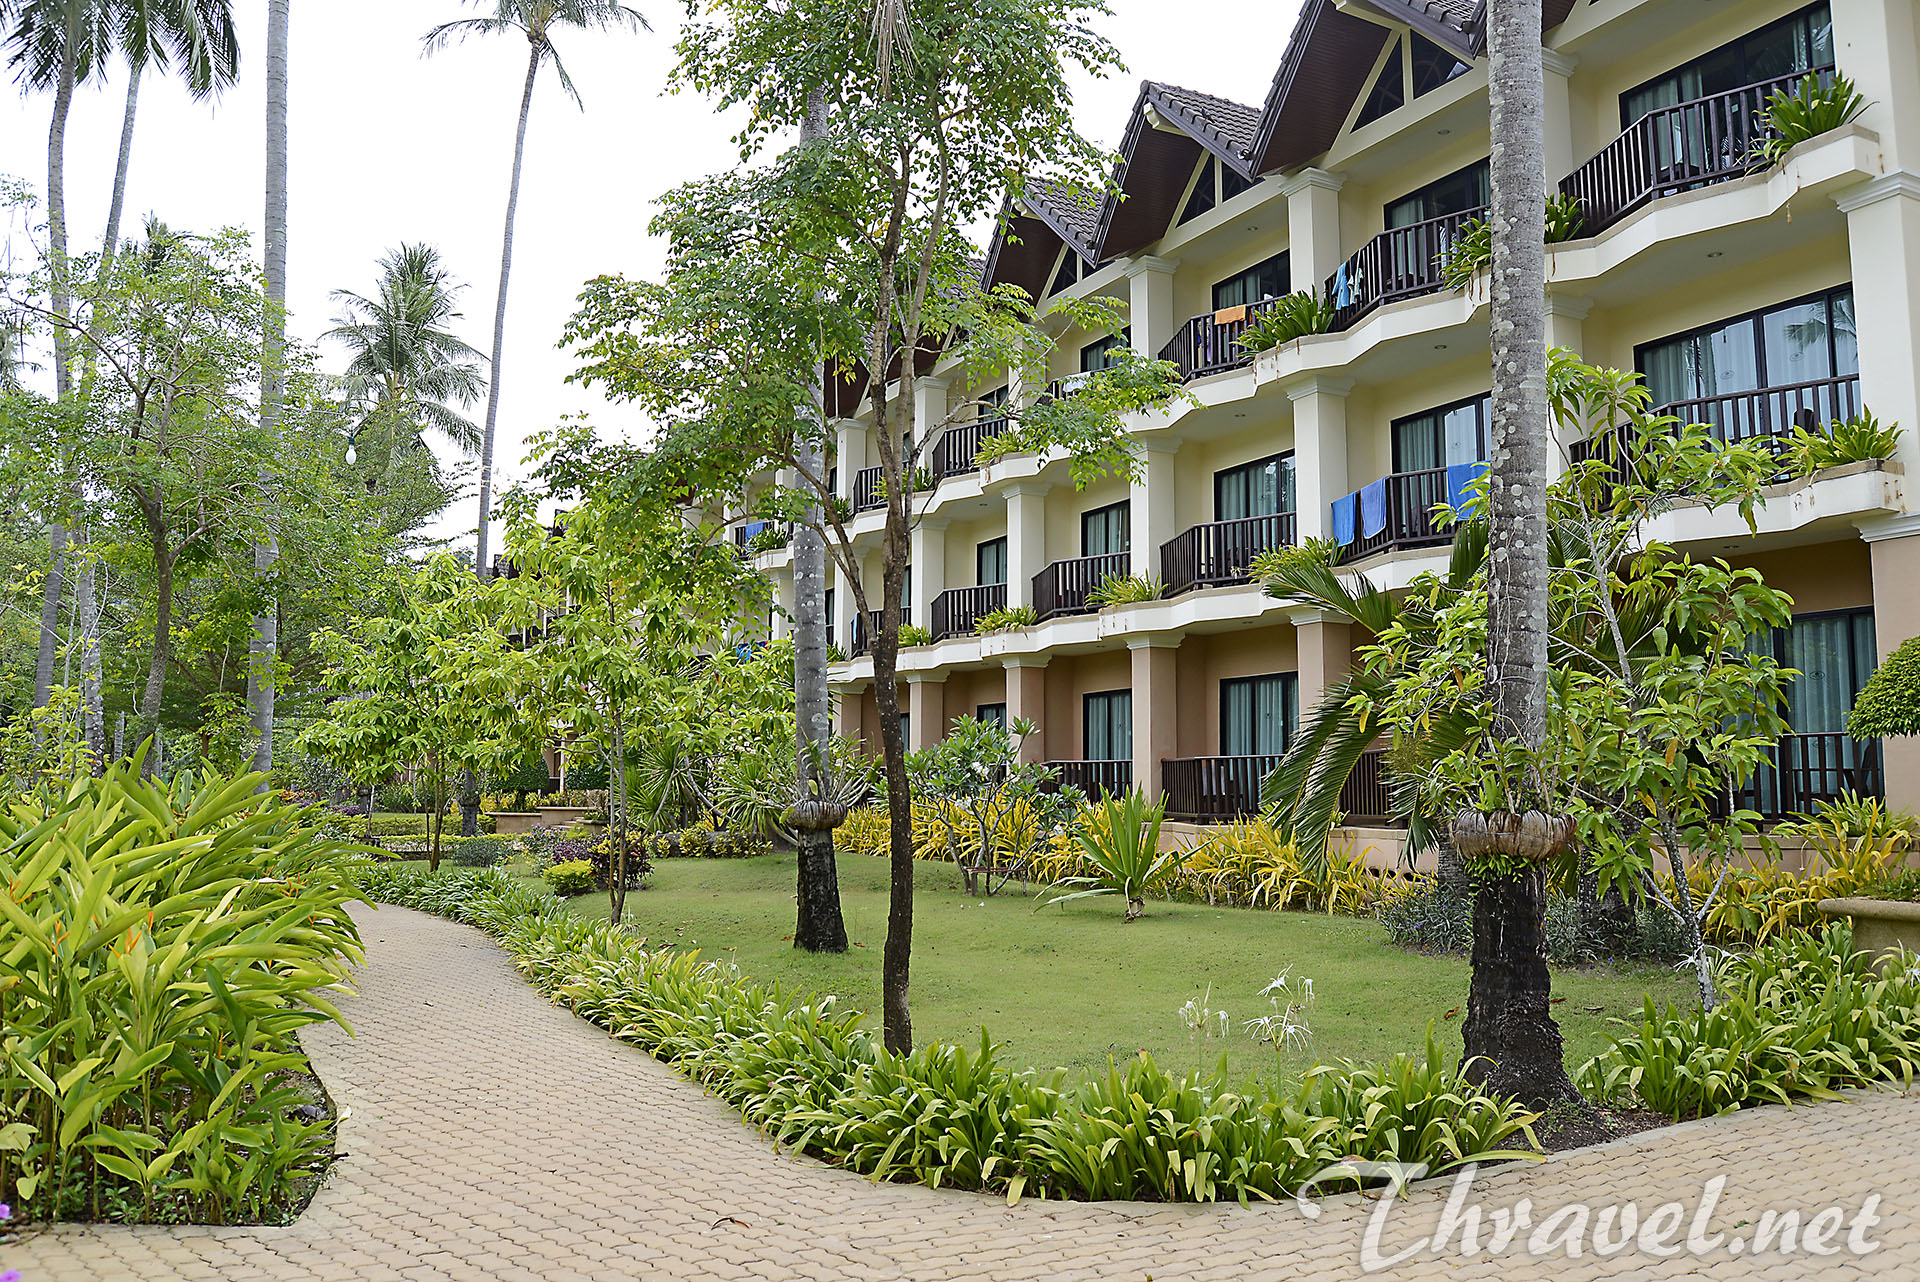 duangjitt-resort-and-spa-hotel-patong-beach-phuket-thailand-09